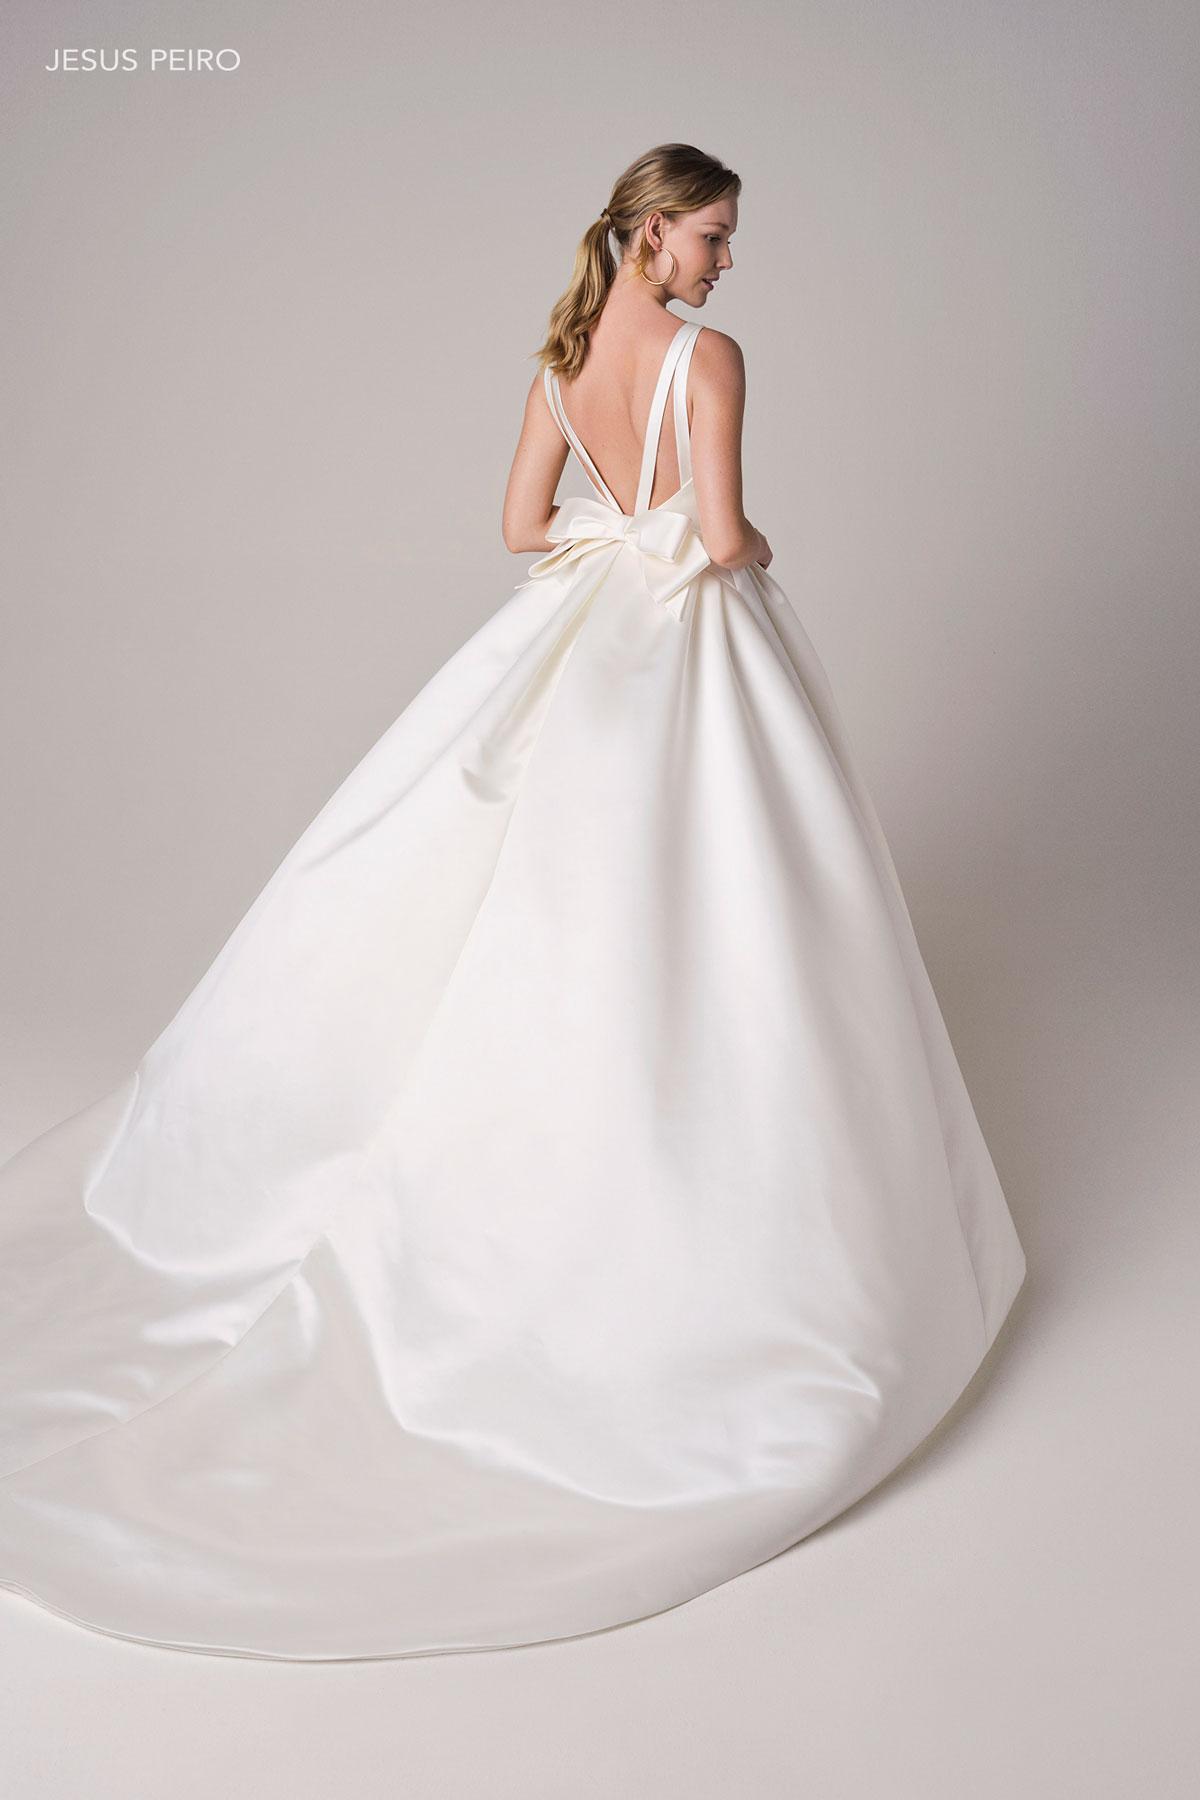 Vestido novia Jesús Peiró Ref.263